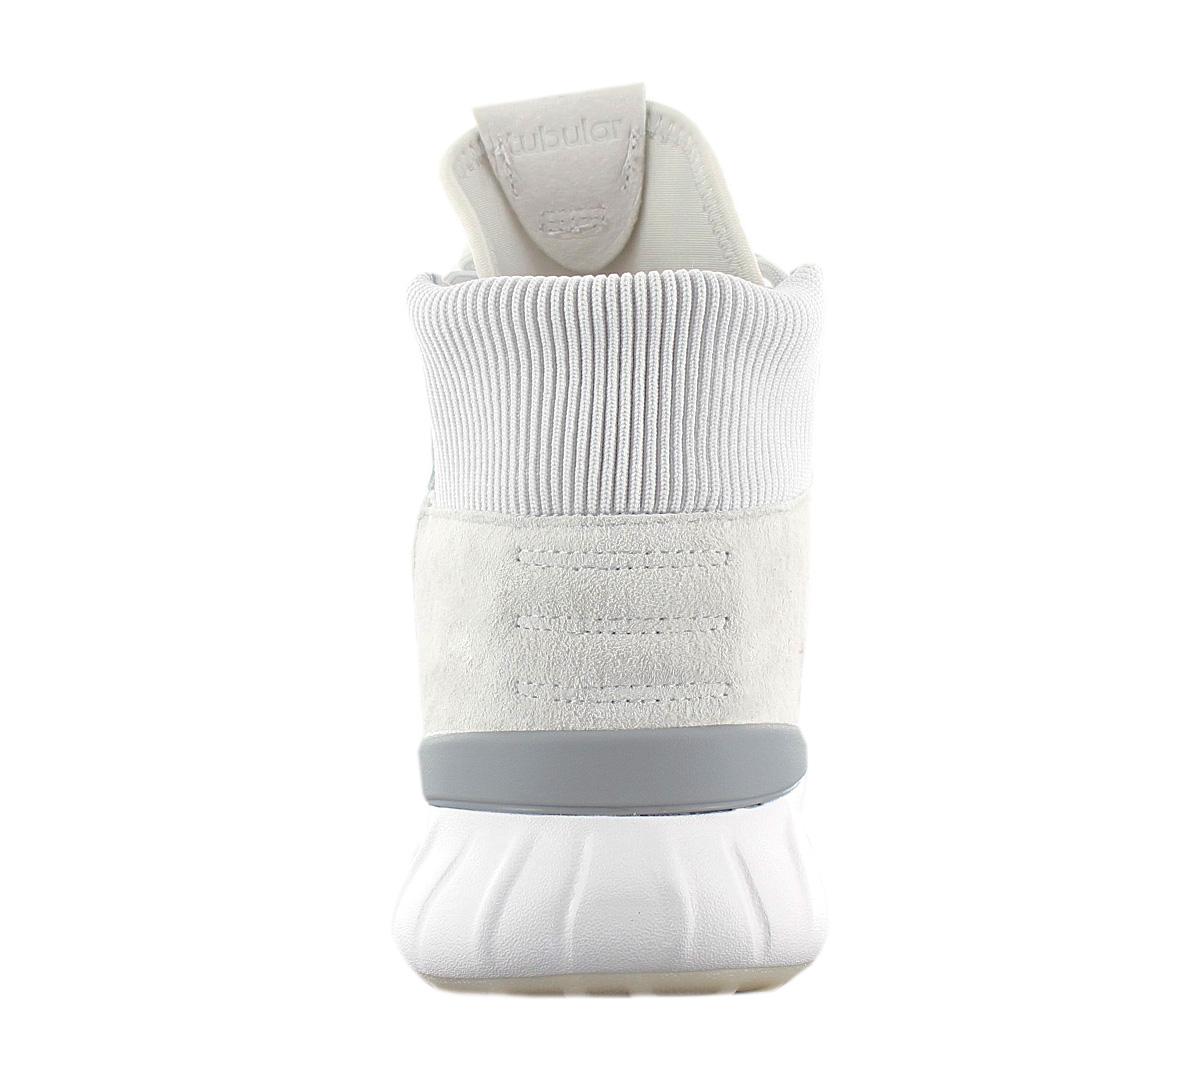 5883a719581 Adidas Originals Tubular x 2.0 Pk Primeknit Trainers Shoes CQ1375 ...